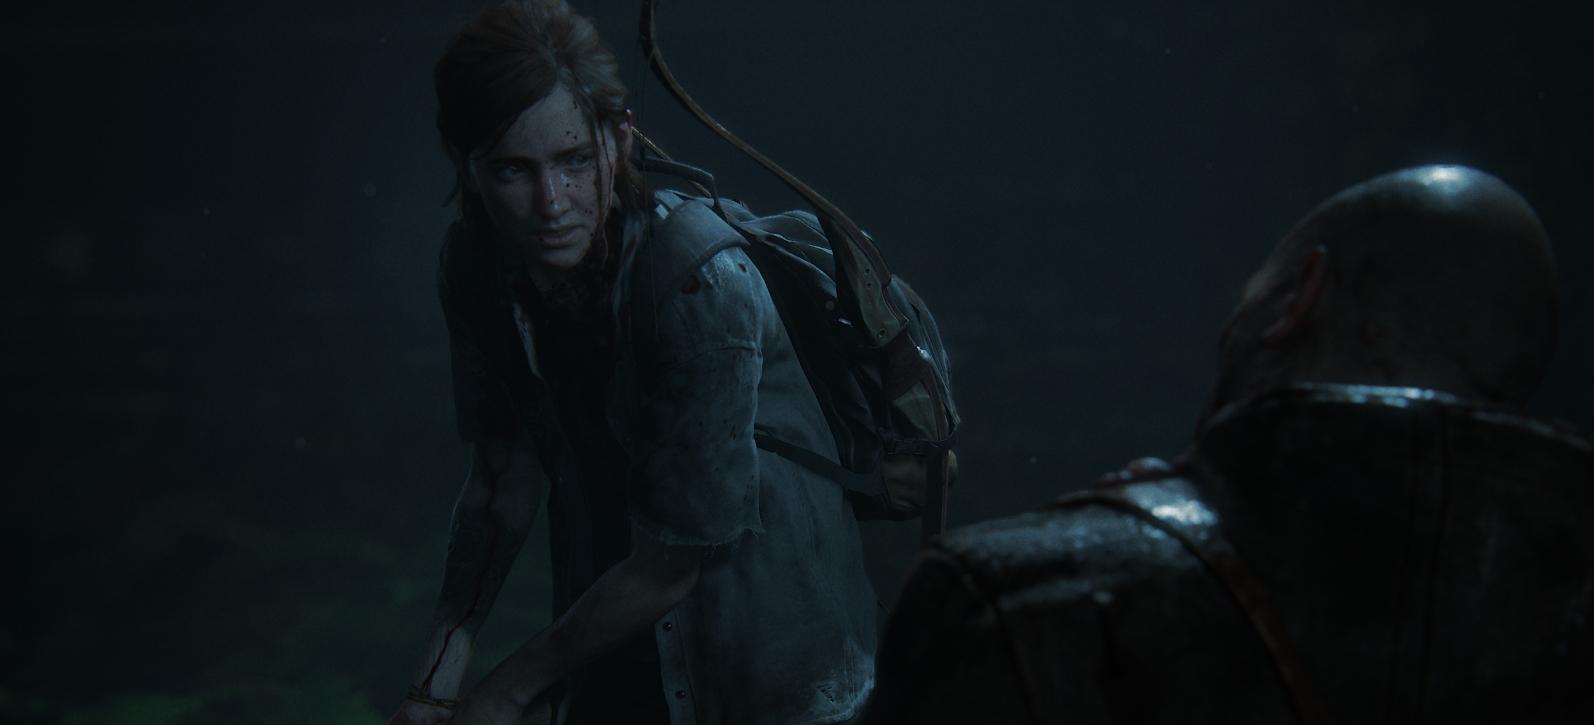 Ellie facing an enemy in the last of us 2